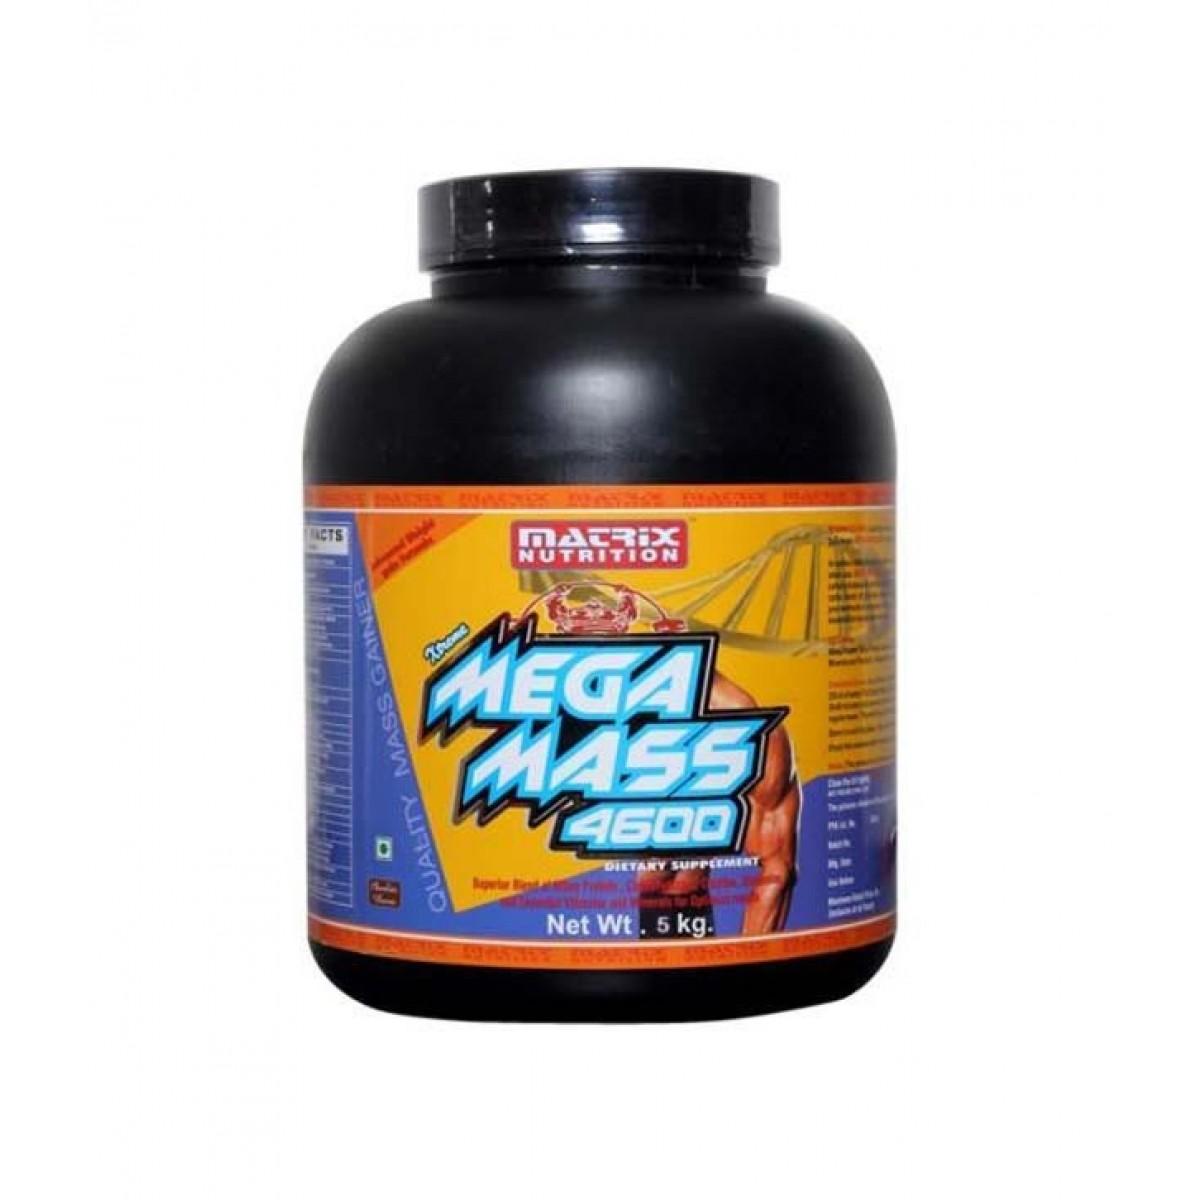 Matrix Nutrition Mega Mass 4600